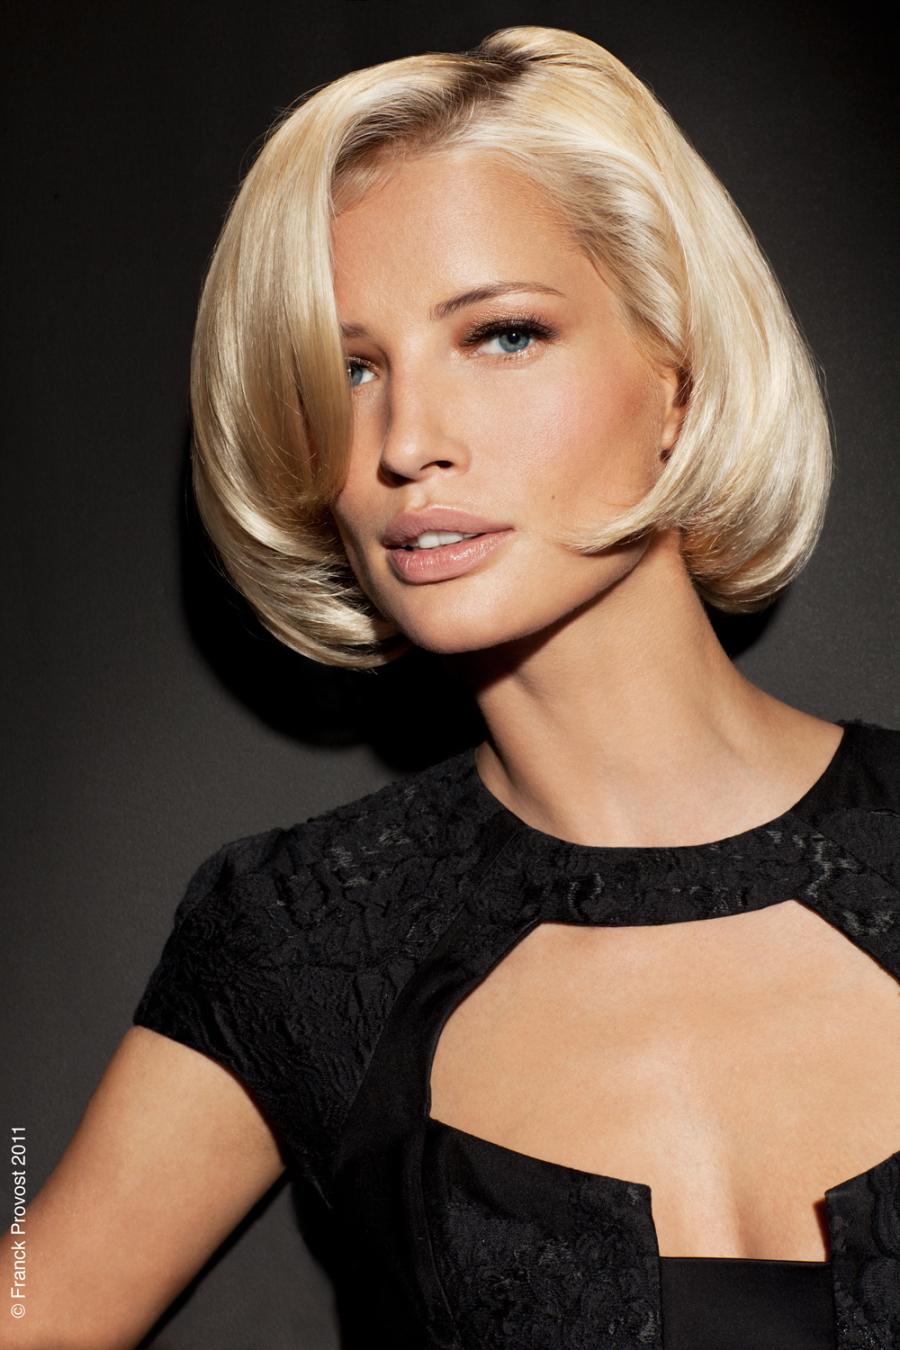 Причёски женщинам за 40 каре